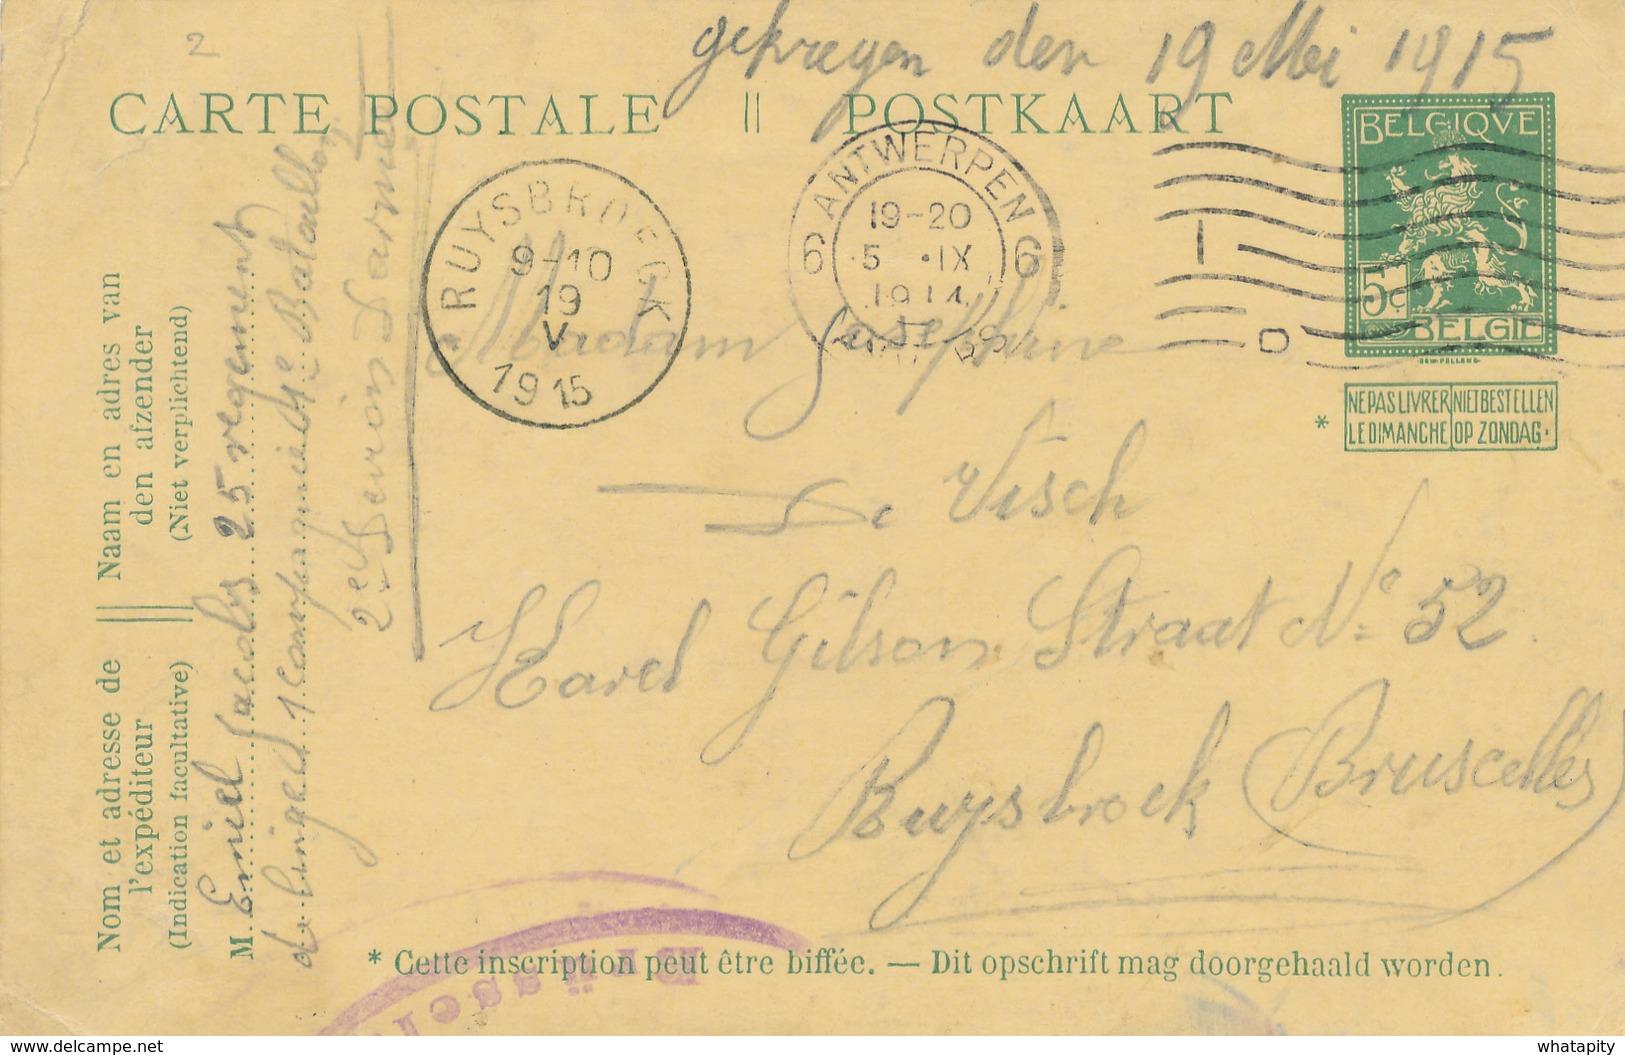 550/27 - PREMIERS MOIS DE GUERRE - Entier Pellens KIEL Via ANTWERPEN 5 IX 1914 Vers RUYSBROECK - Arrivée 19 Mai 1915 - Invasión